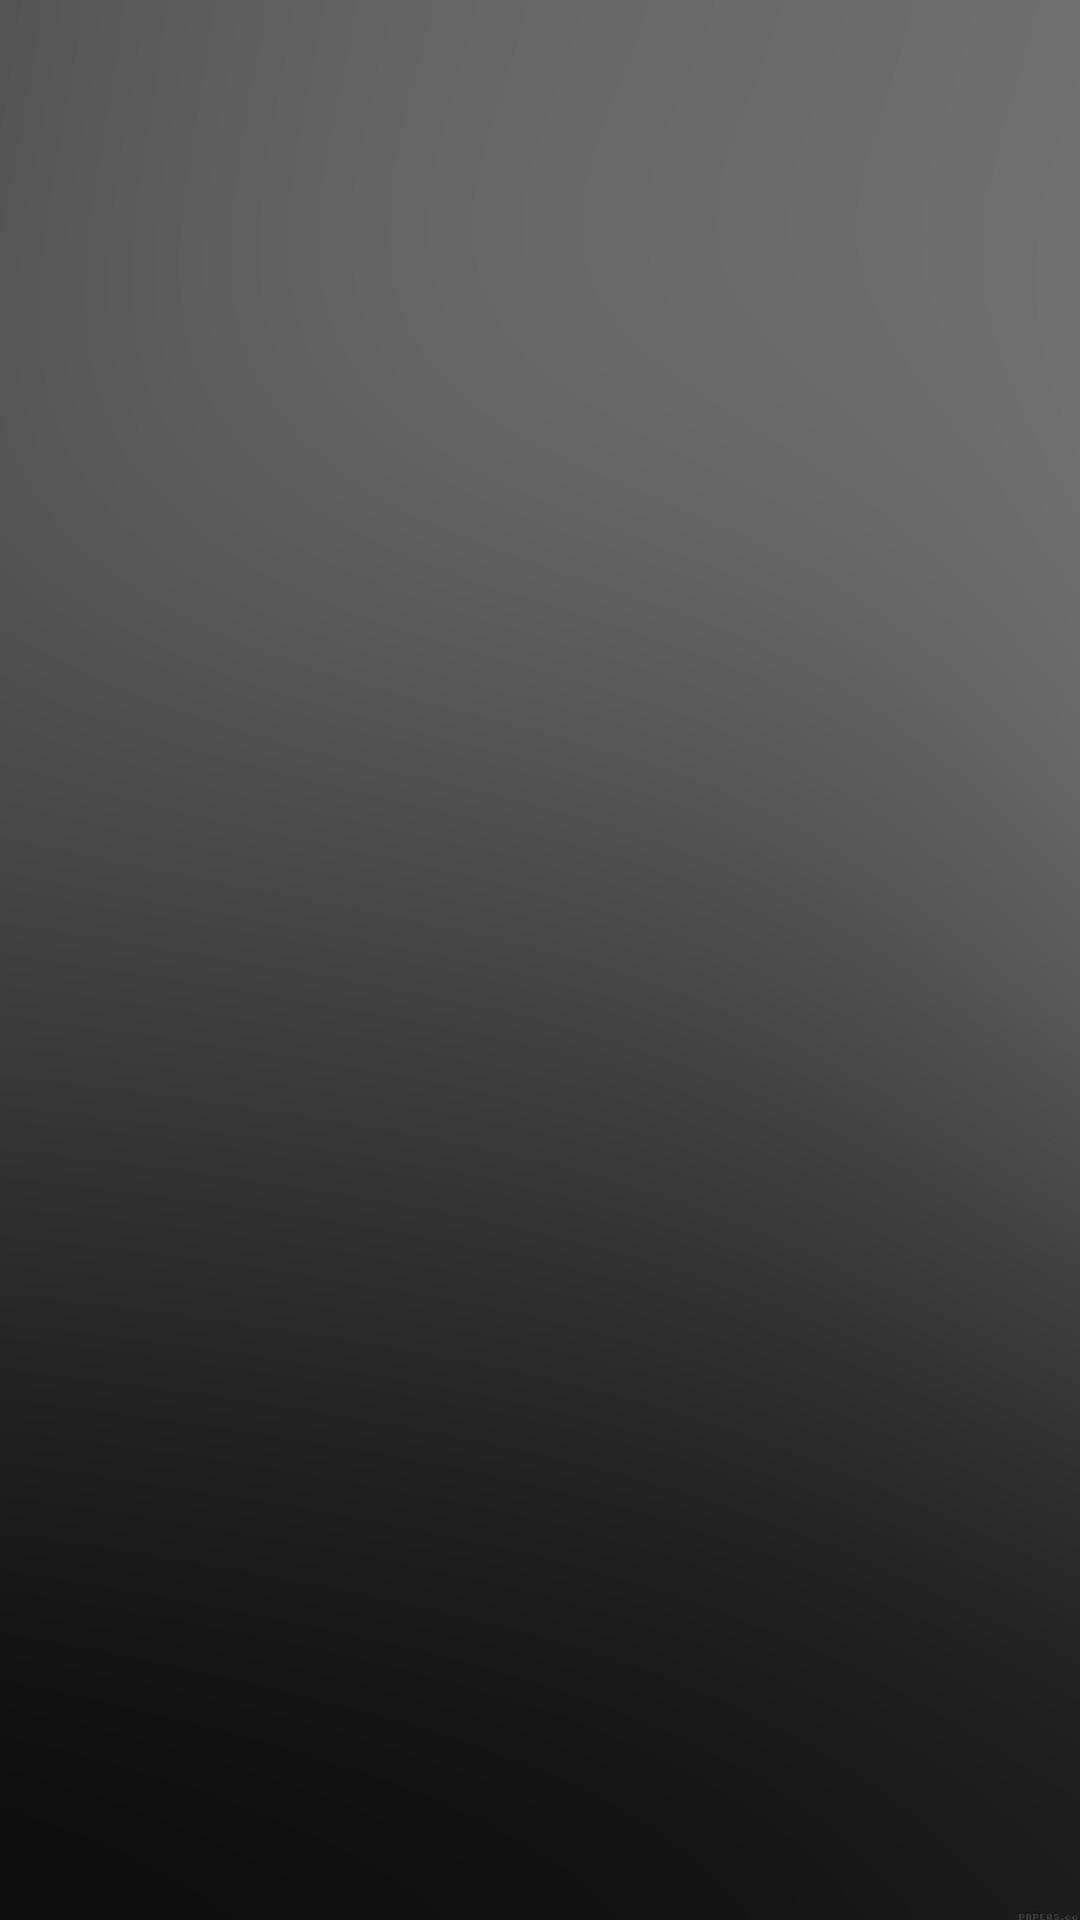 Gray Fade To Dark IPhone 6 Plus Wallpaper (1080×1920)